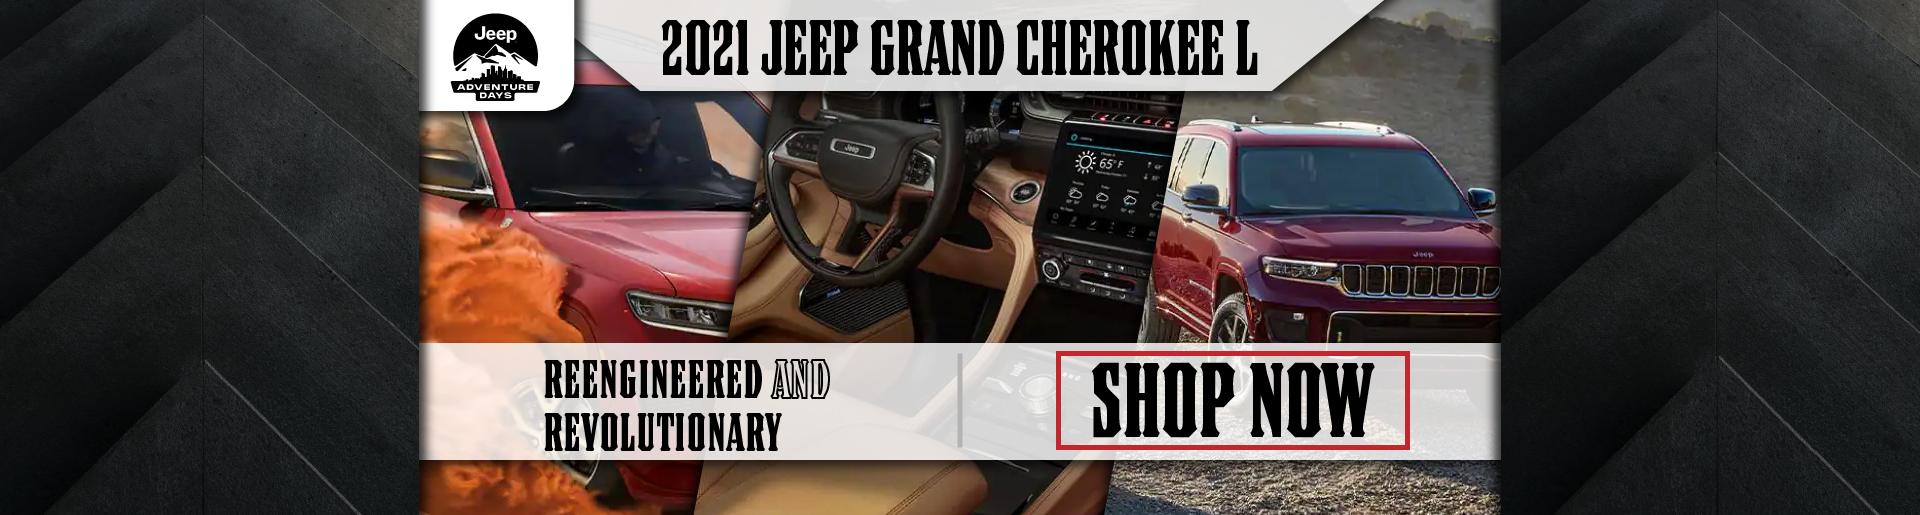 2021 Jeep Grand Cherokee L October Generic